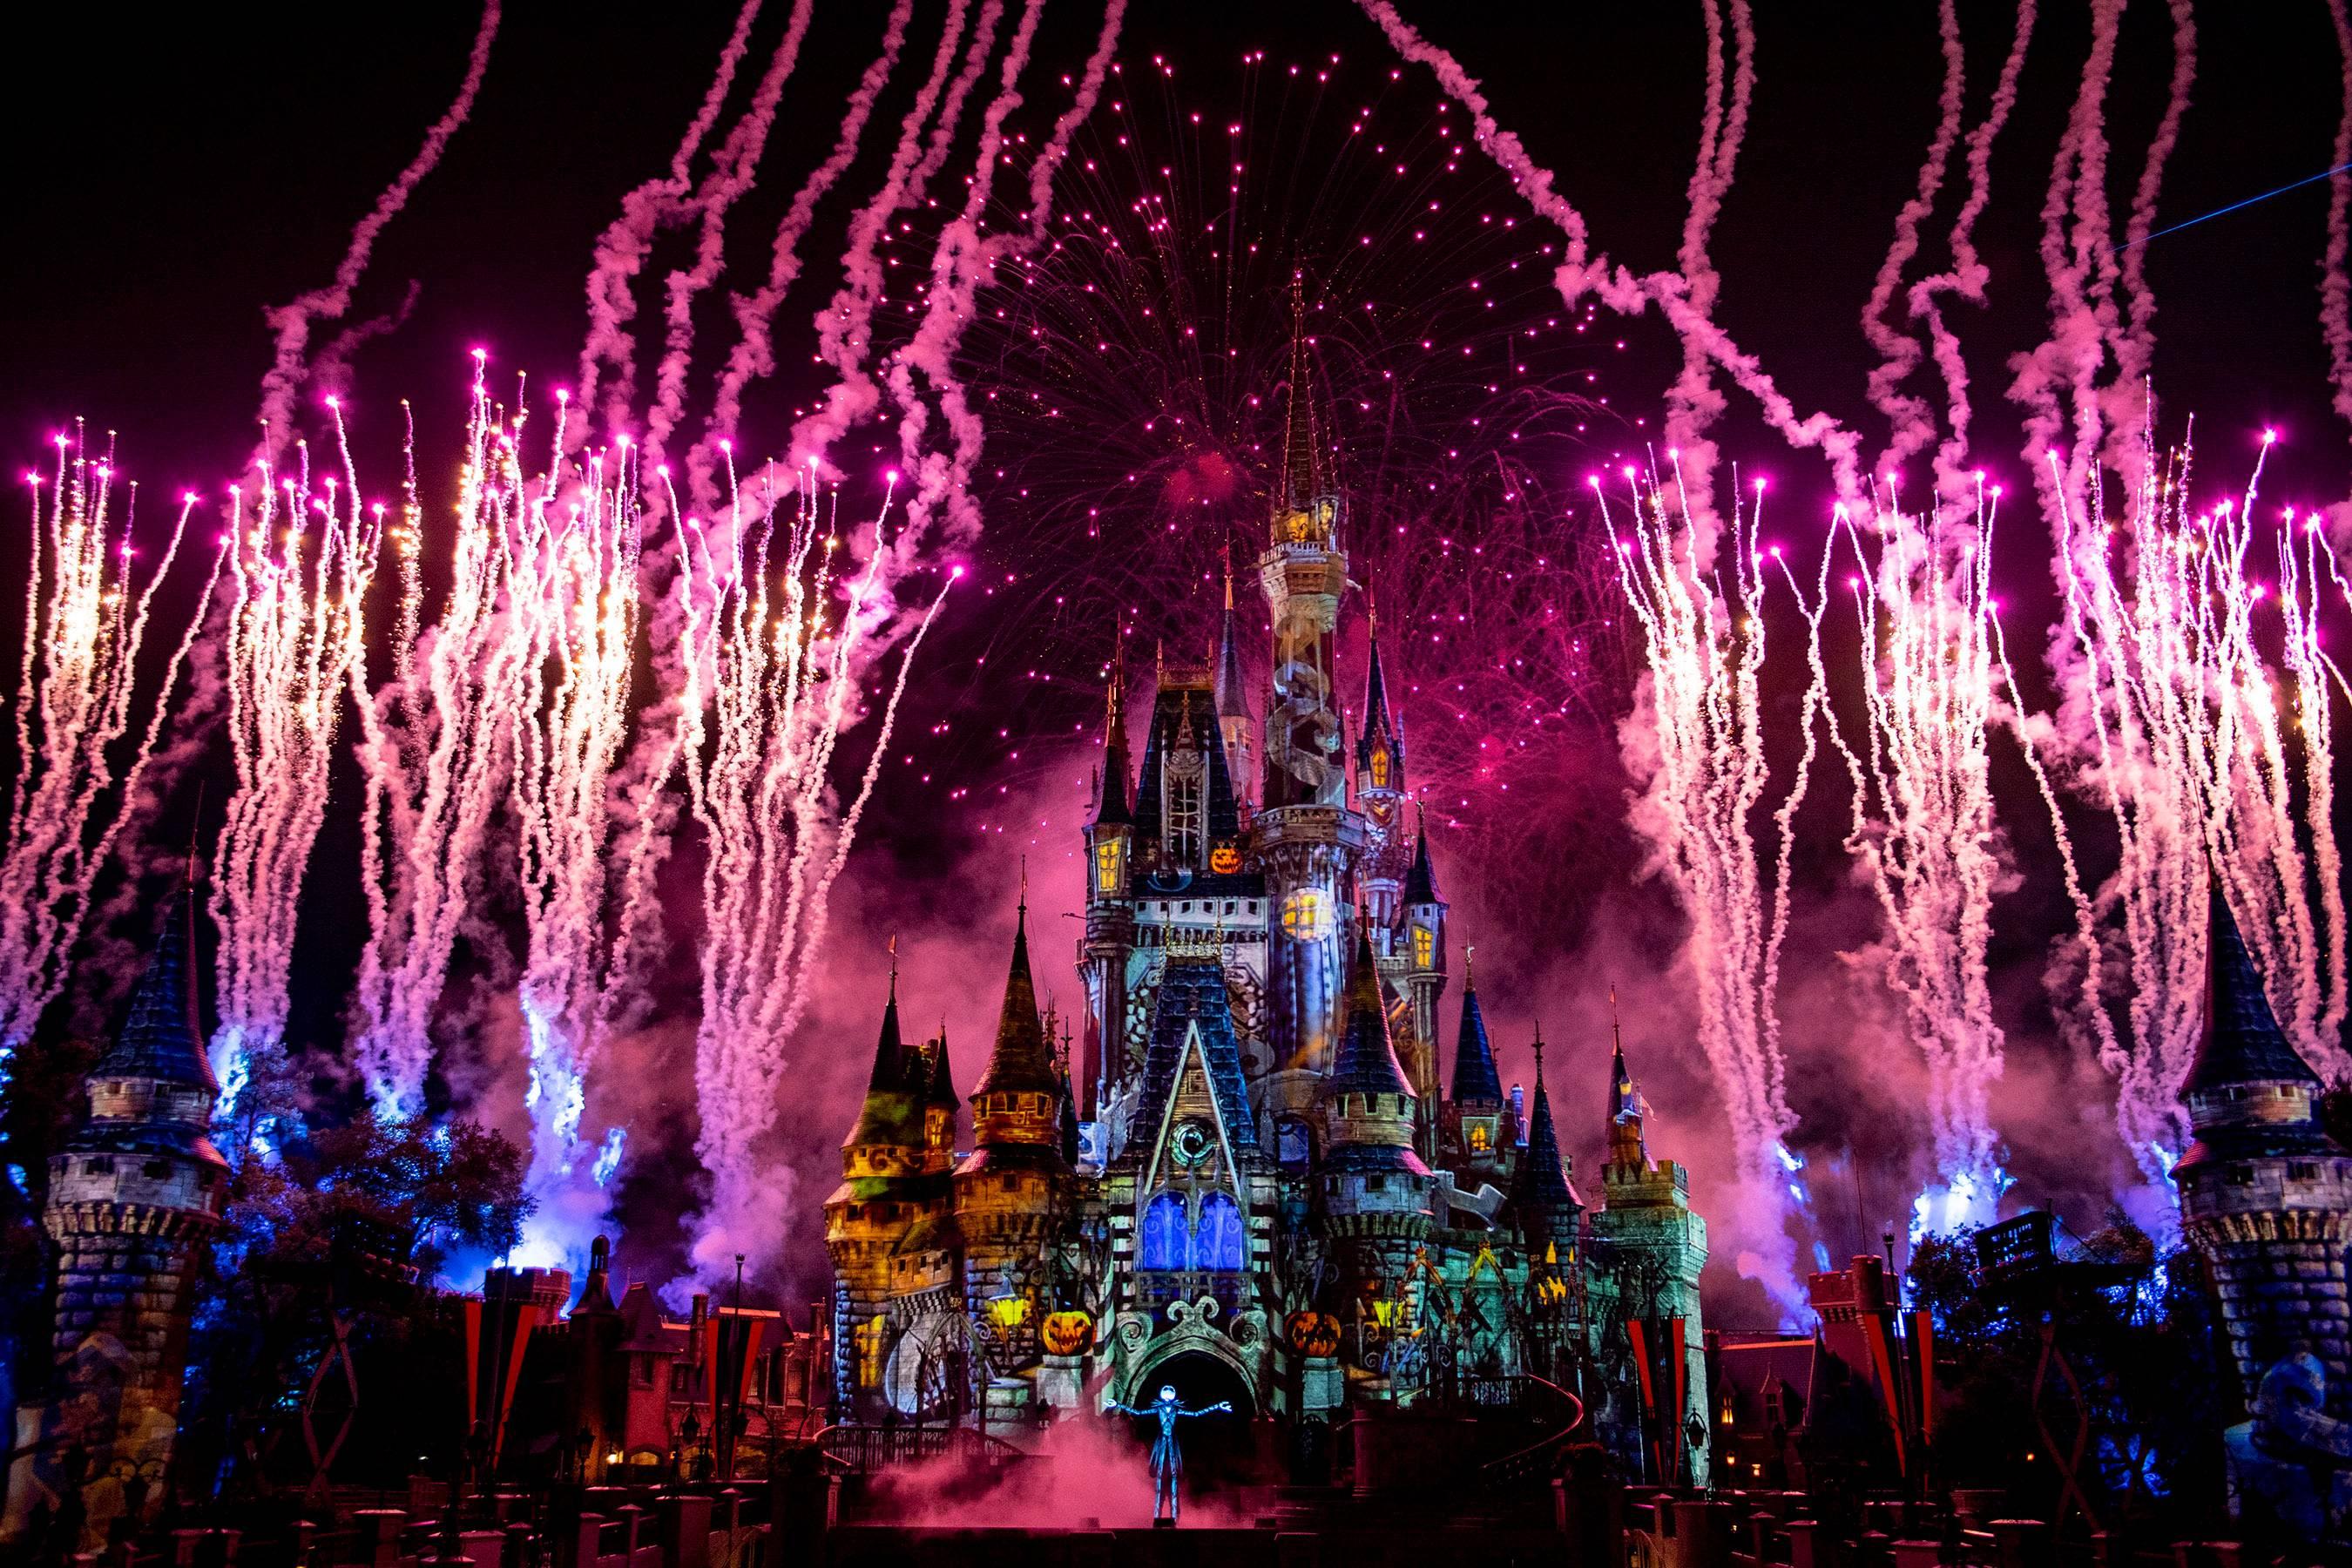 Disney's Not So Spooky Spectacular show